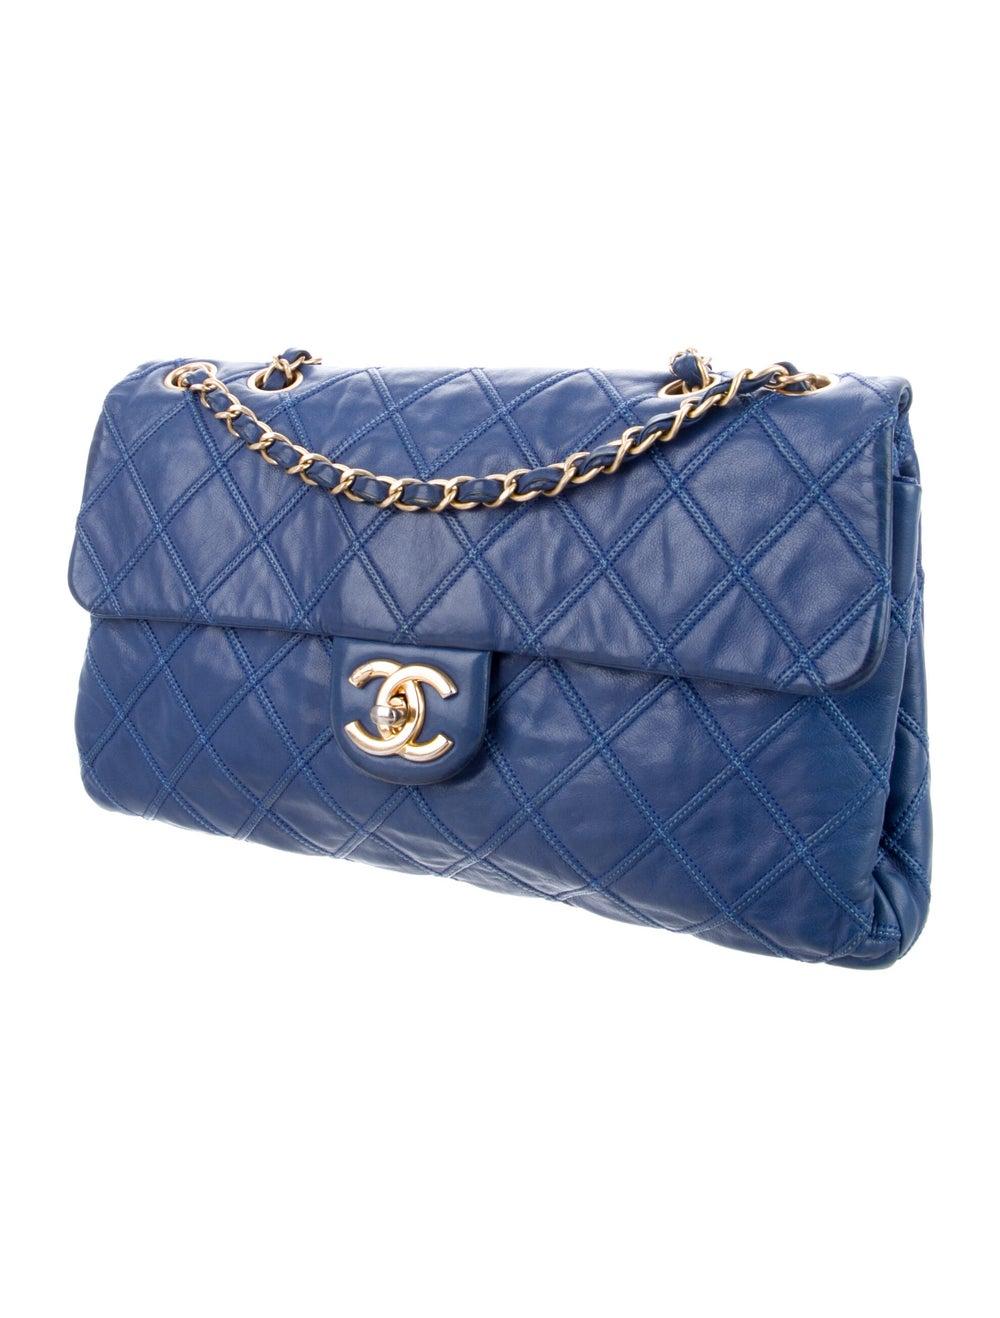 Chanel Thin City Flap Bag Blue - image 3